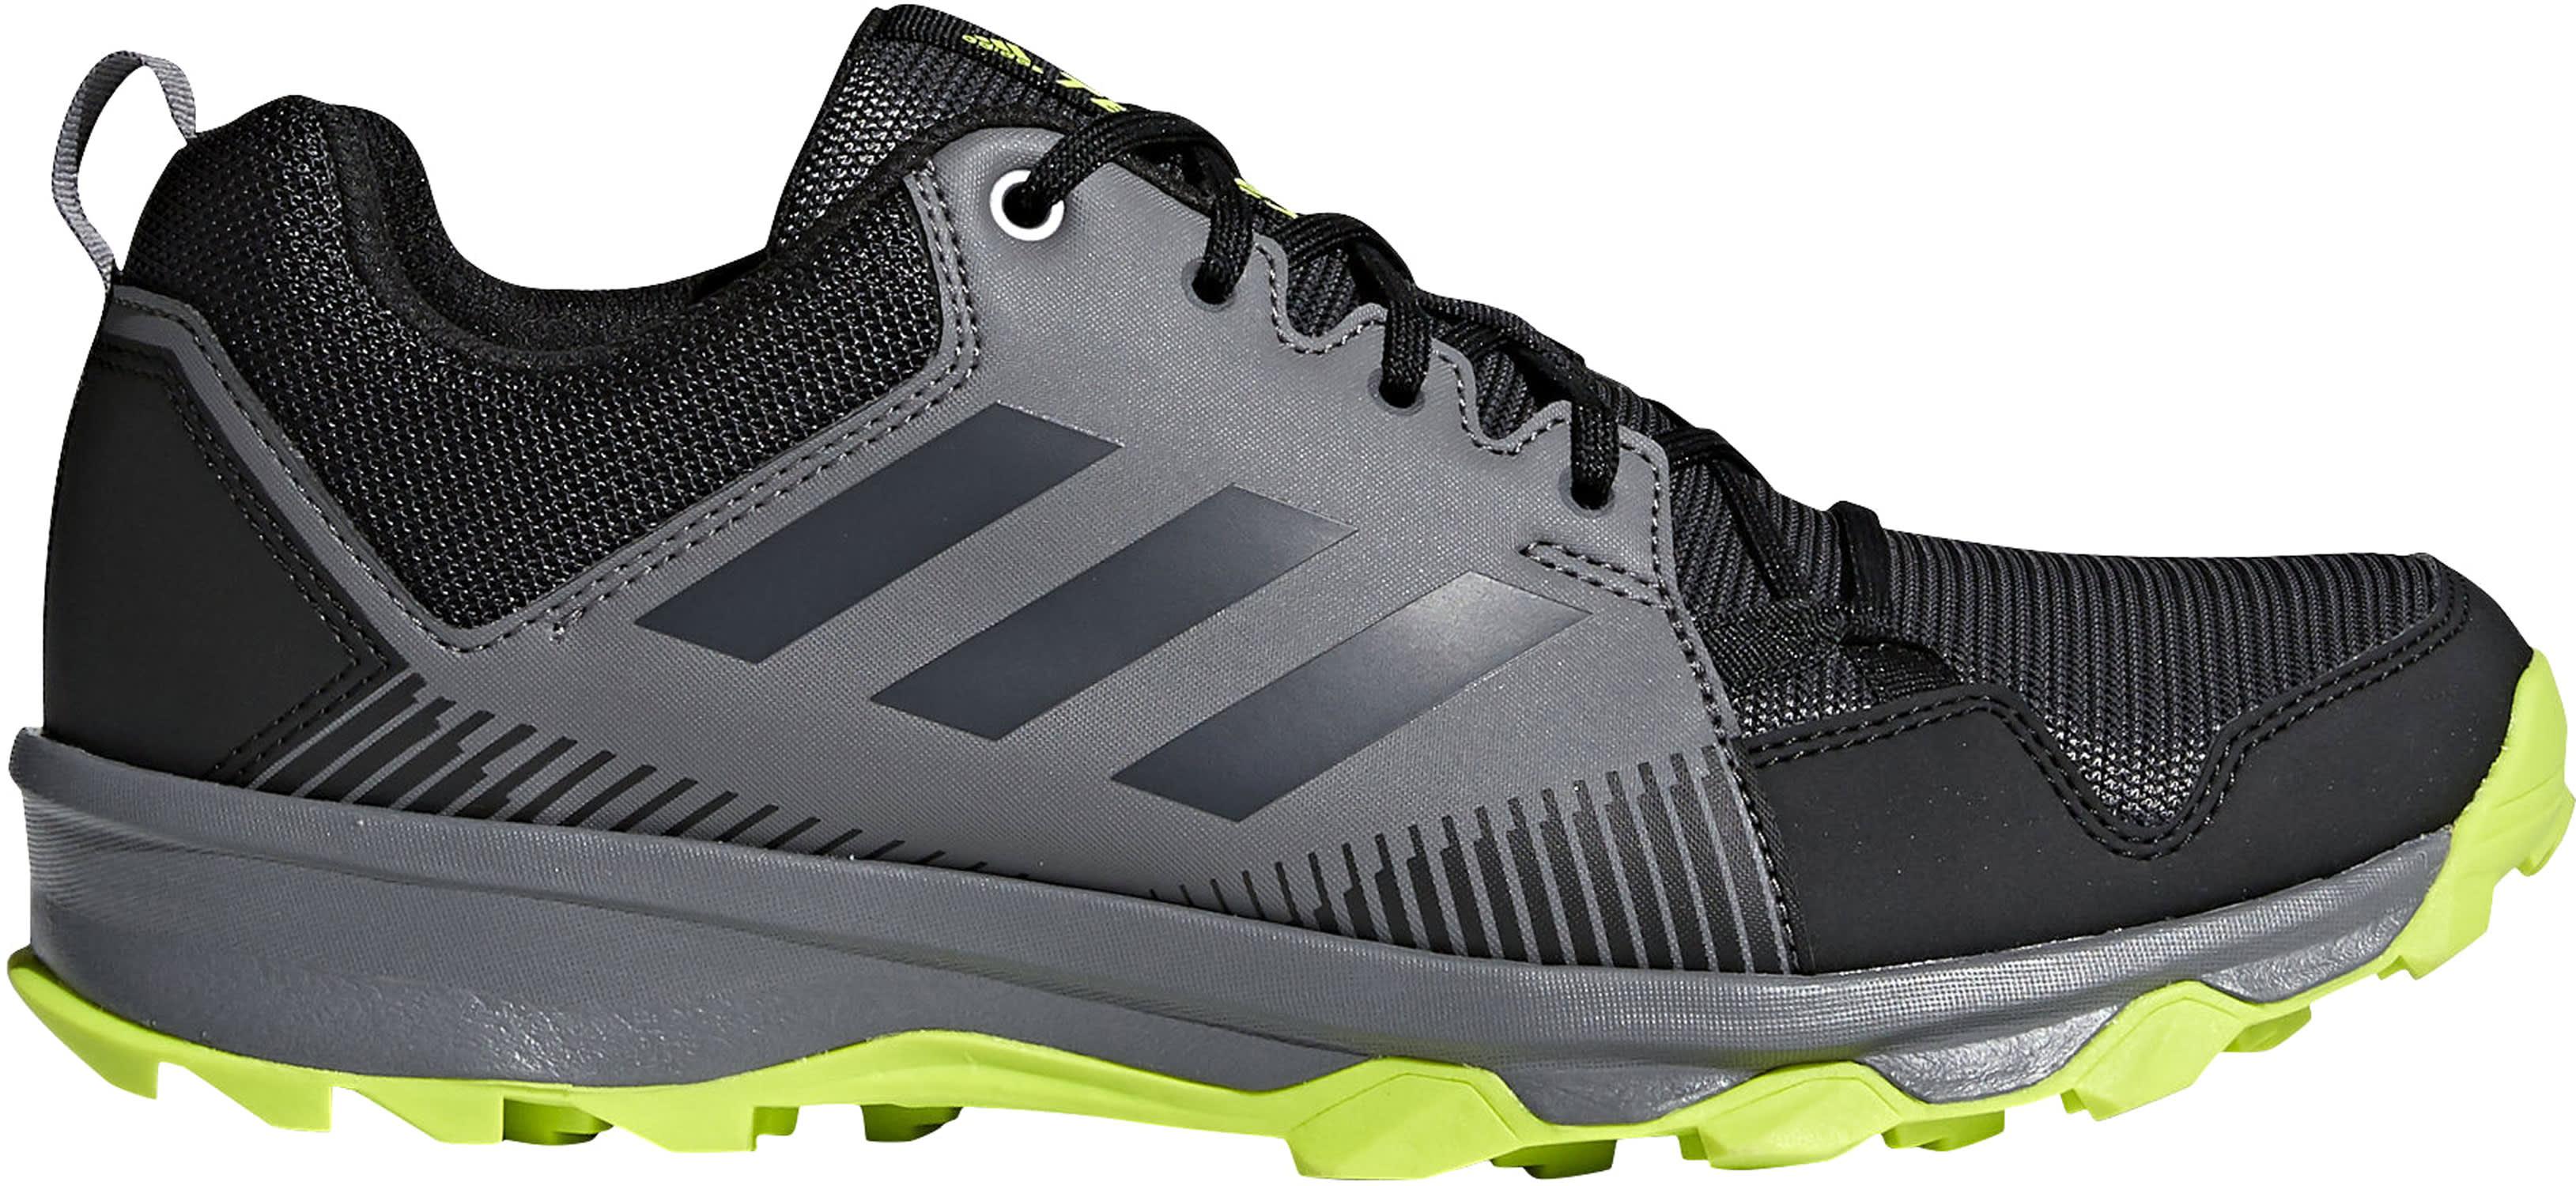 free shipping c37c9 1df43 Adidas Terrex Tracerocker Hiking Shoes - thumbnail 1